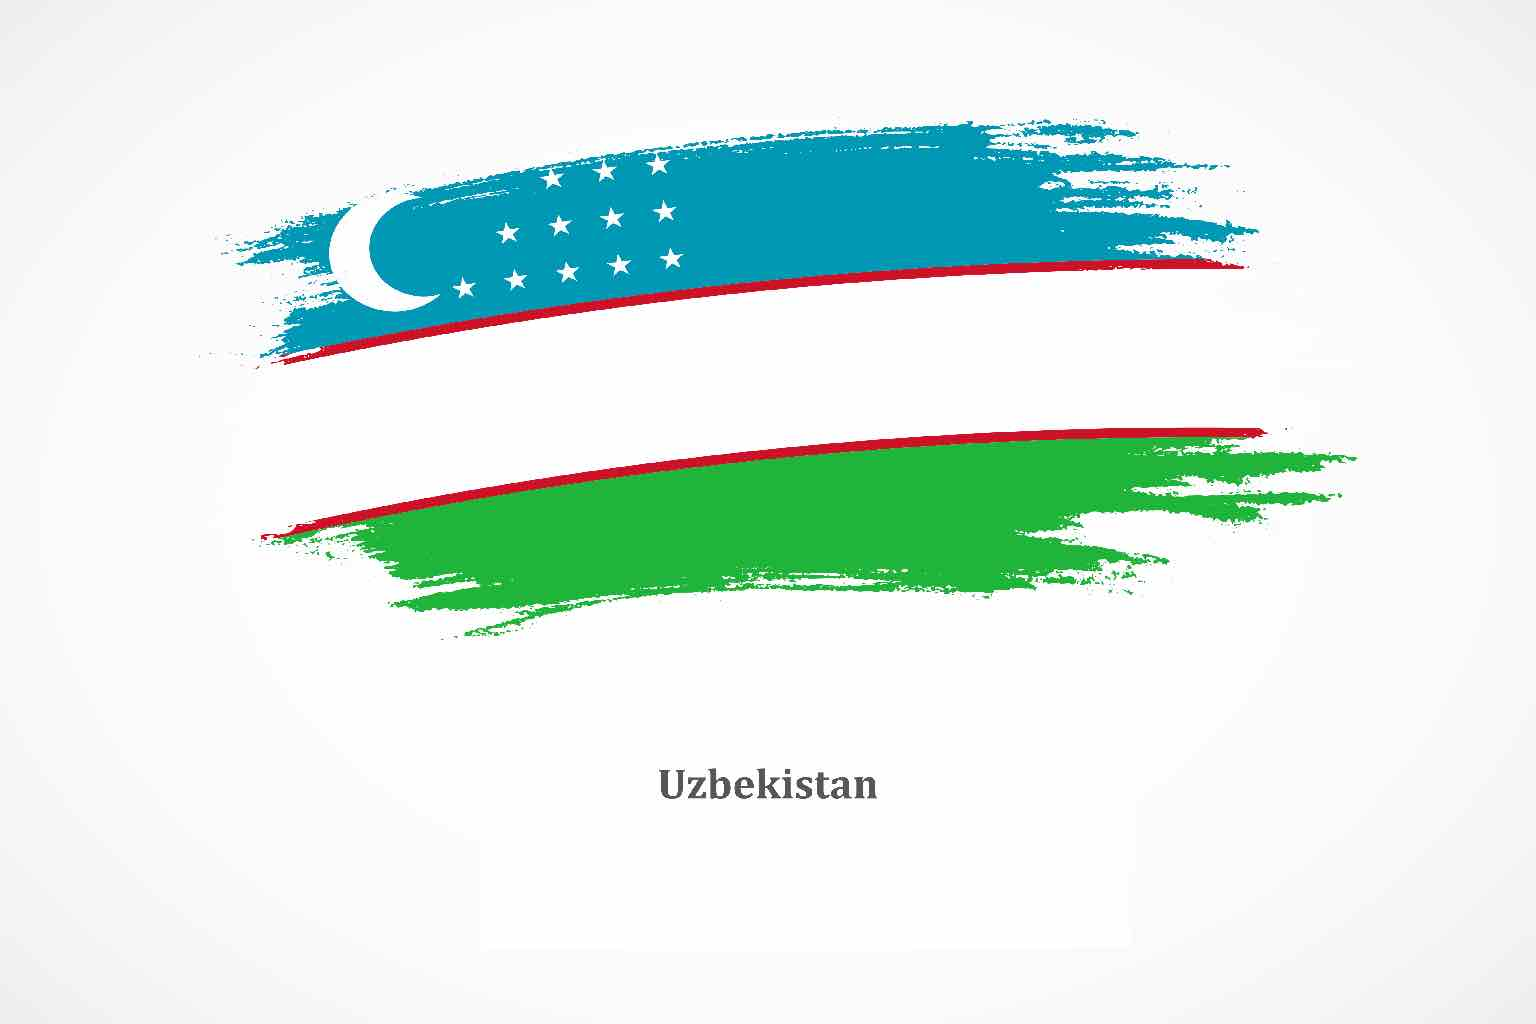 An artistically stressed flag of Uzbekistan